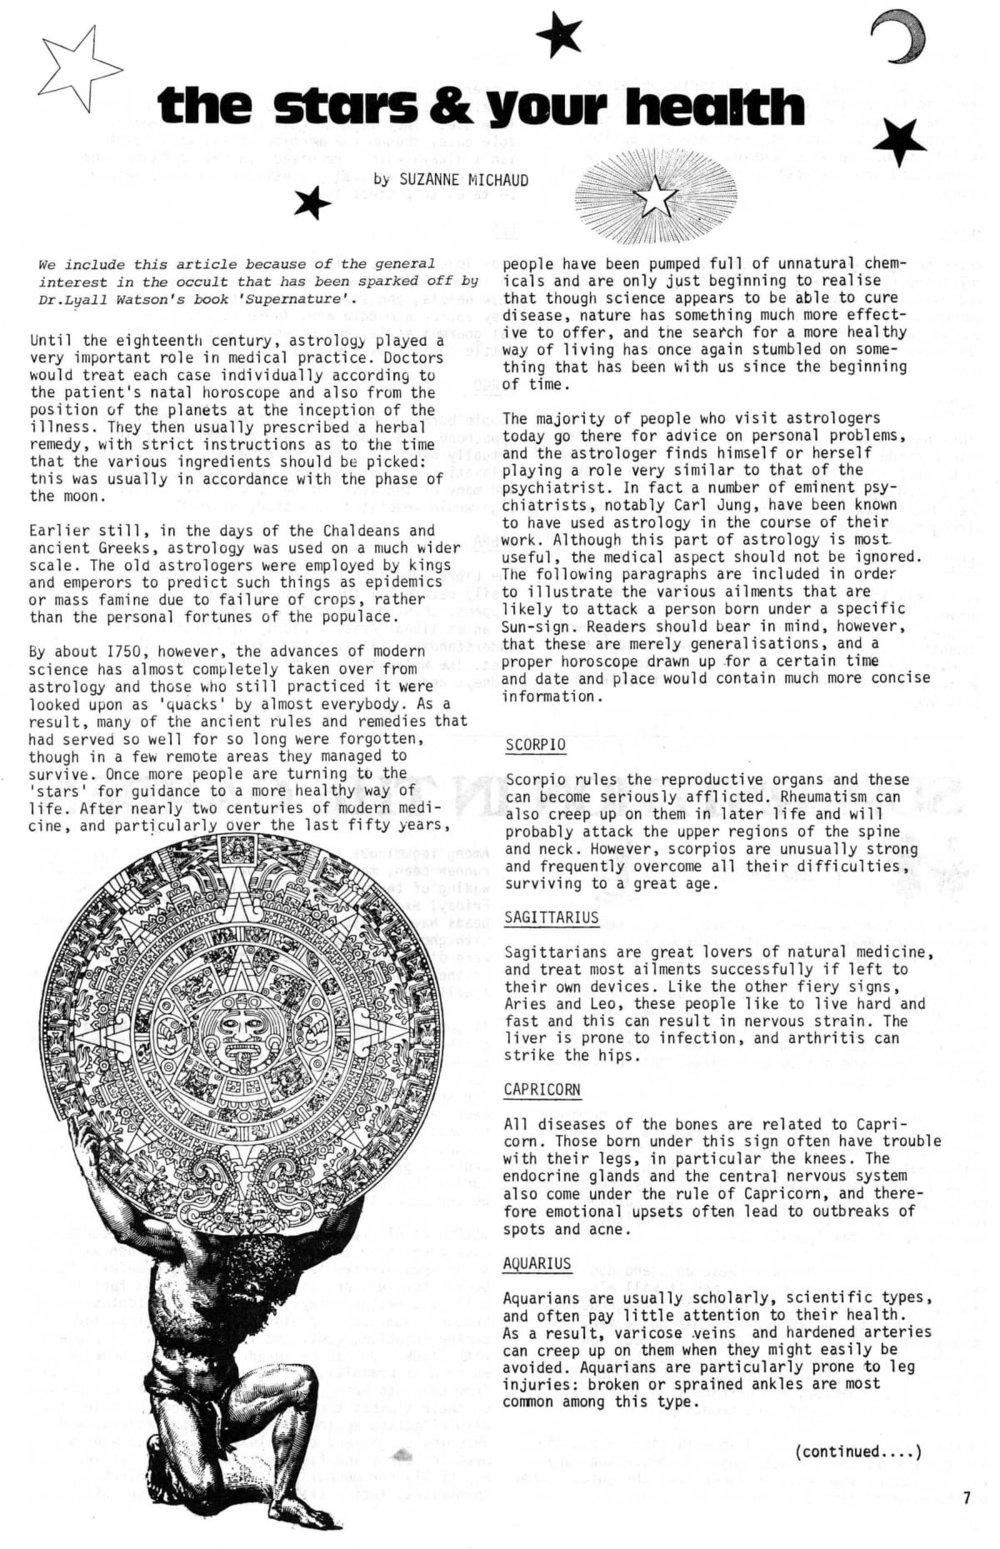 seed-v2-n10-oct1973-07.jpg